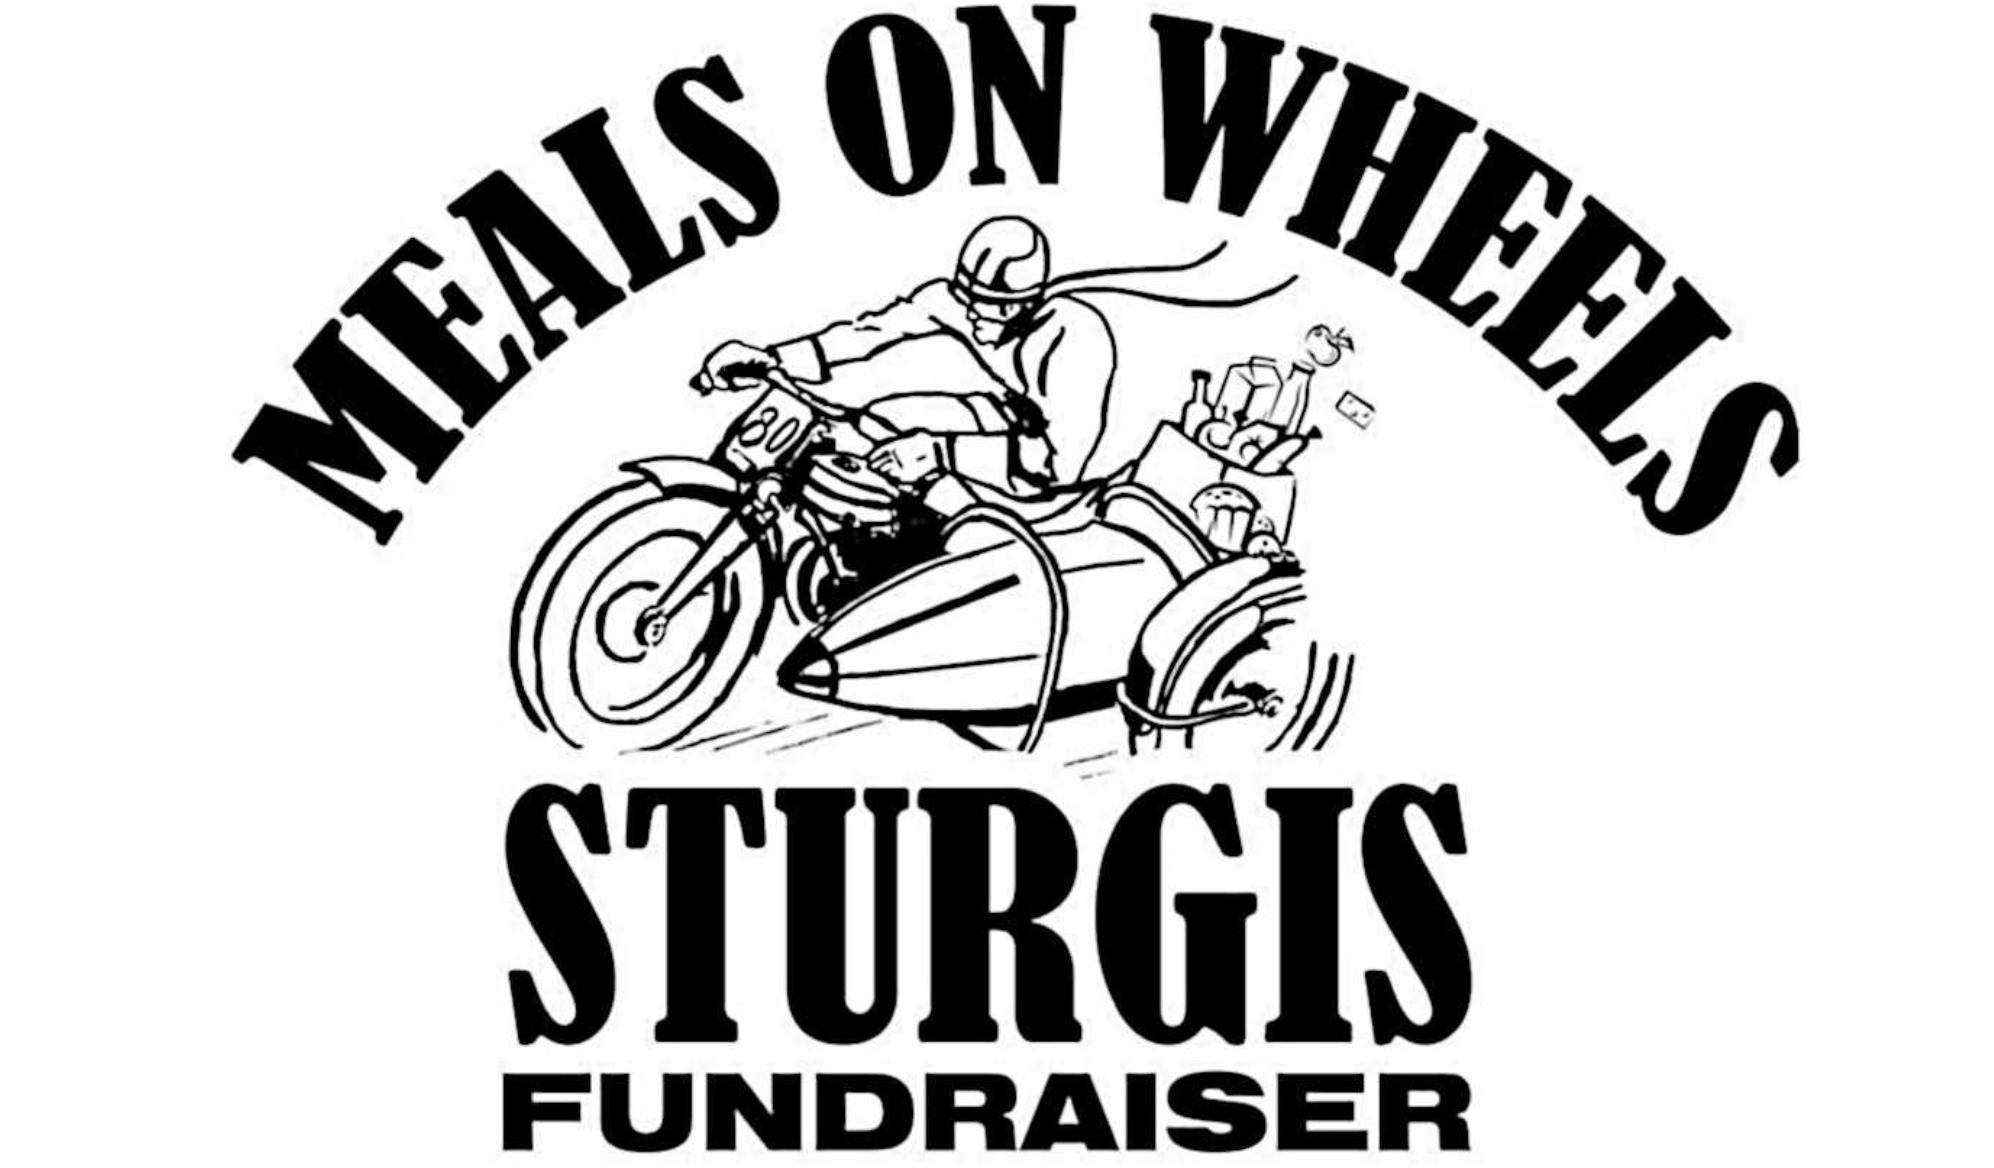 Meals on Wheels Sturgis fundraiser